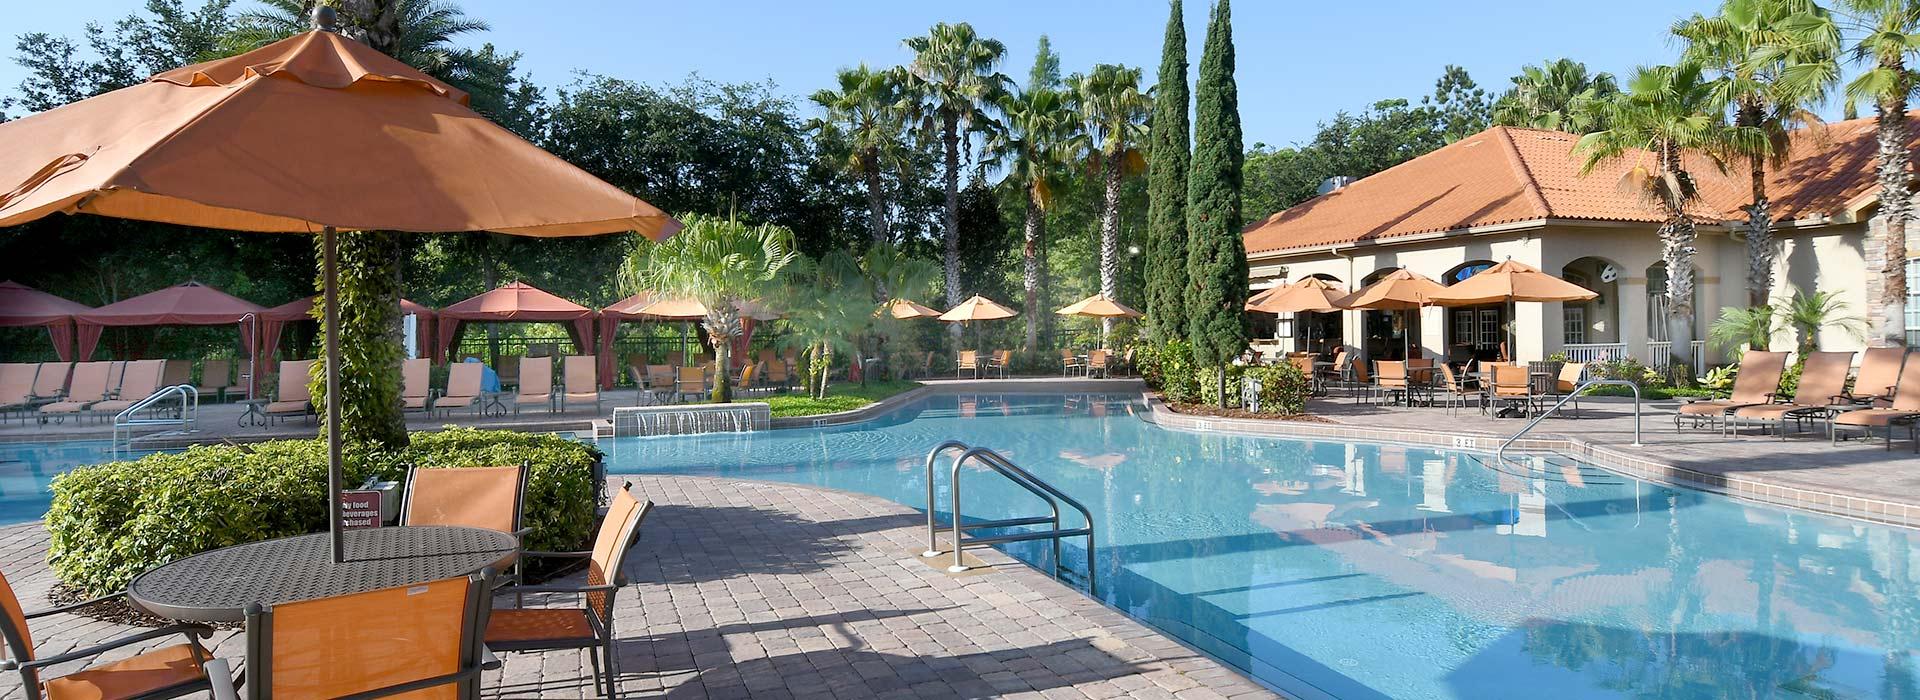 Rooms at Tuscana Resort Orlando by Aston | Aqua-Aston Hotels